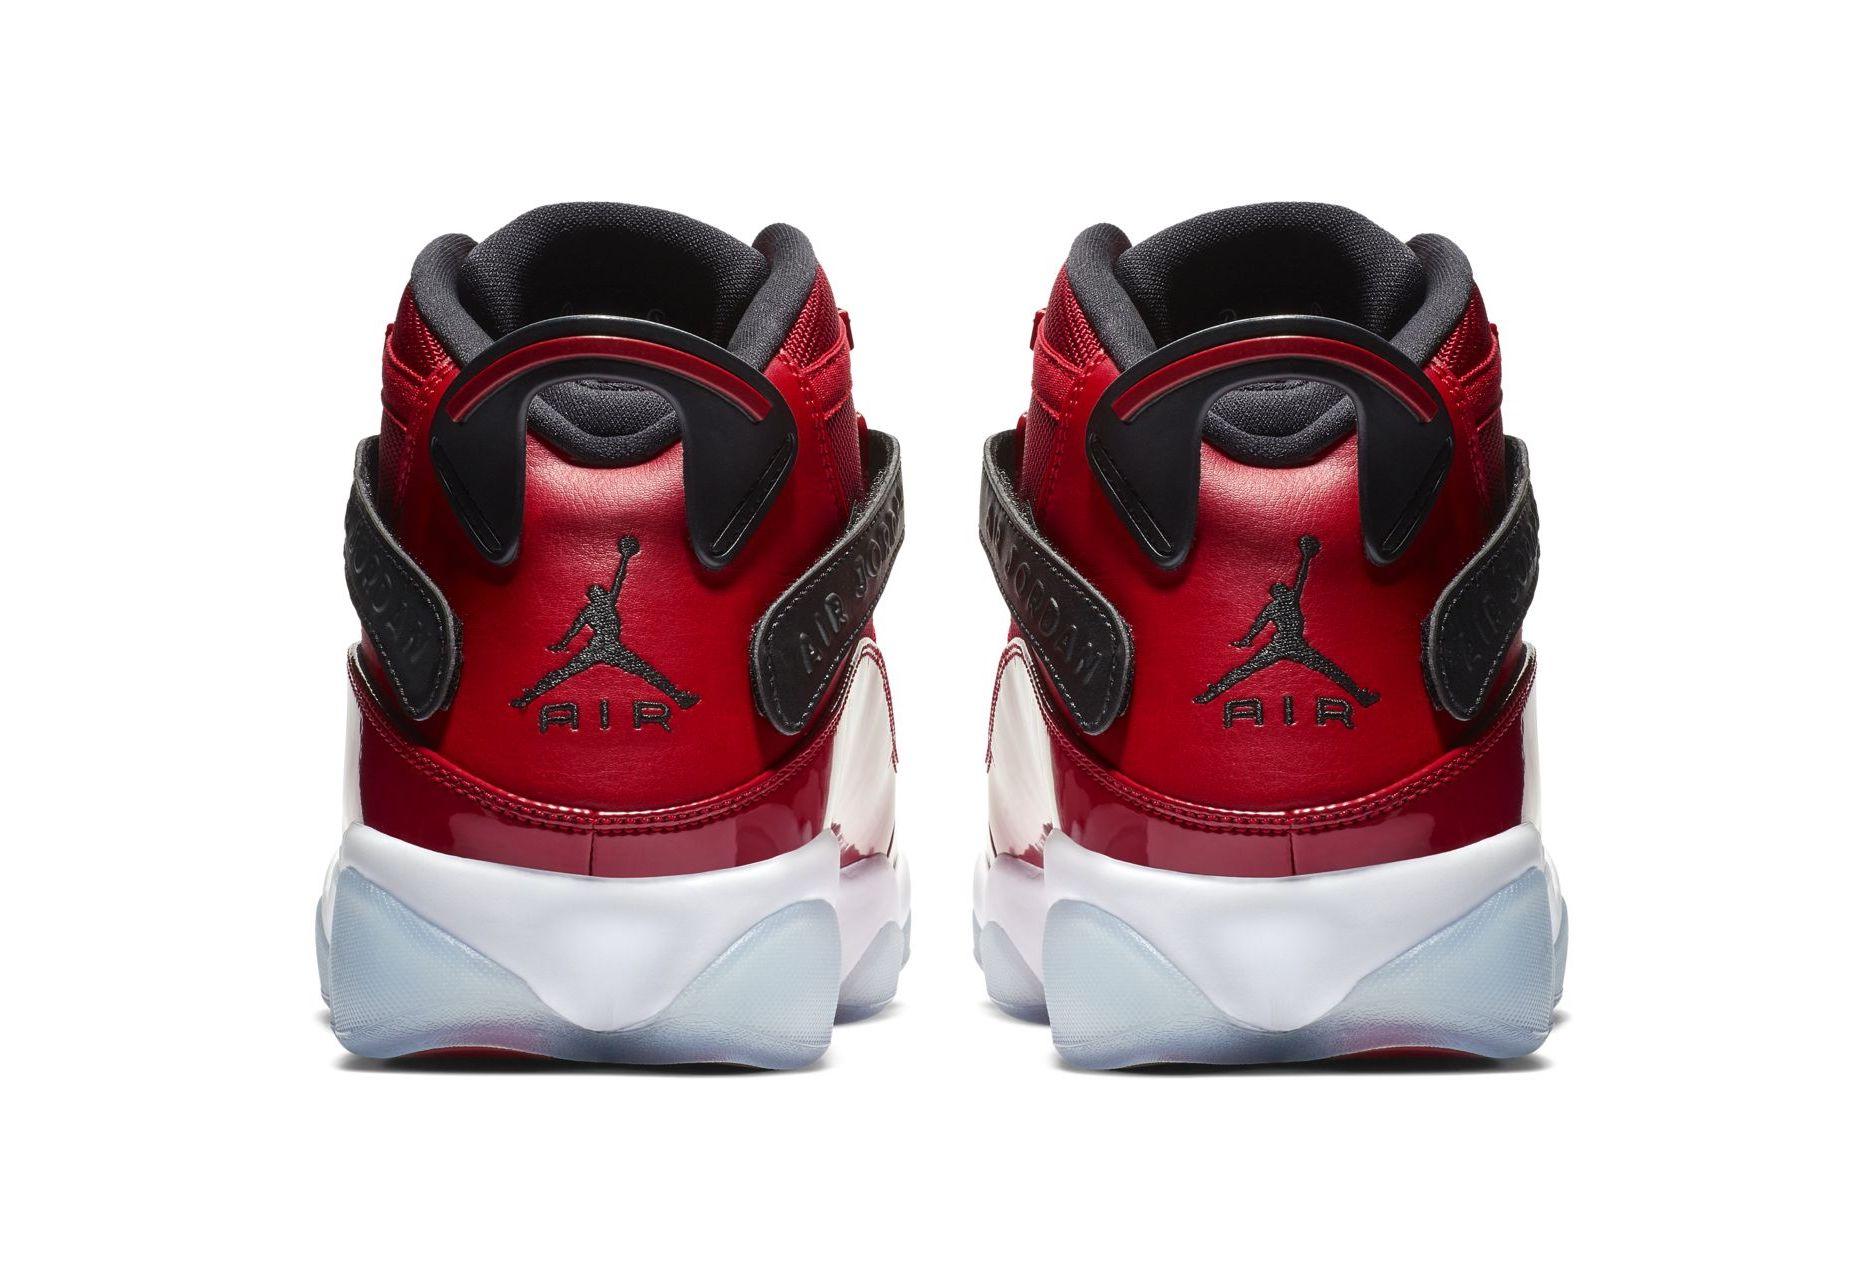 new arrivals 37d0c 8dc27 Jordan 6 Rings University Red Coming Soon • KicksOnFire.com